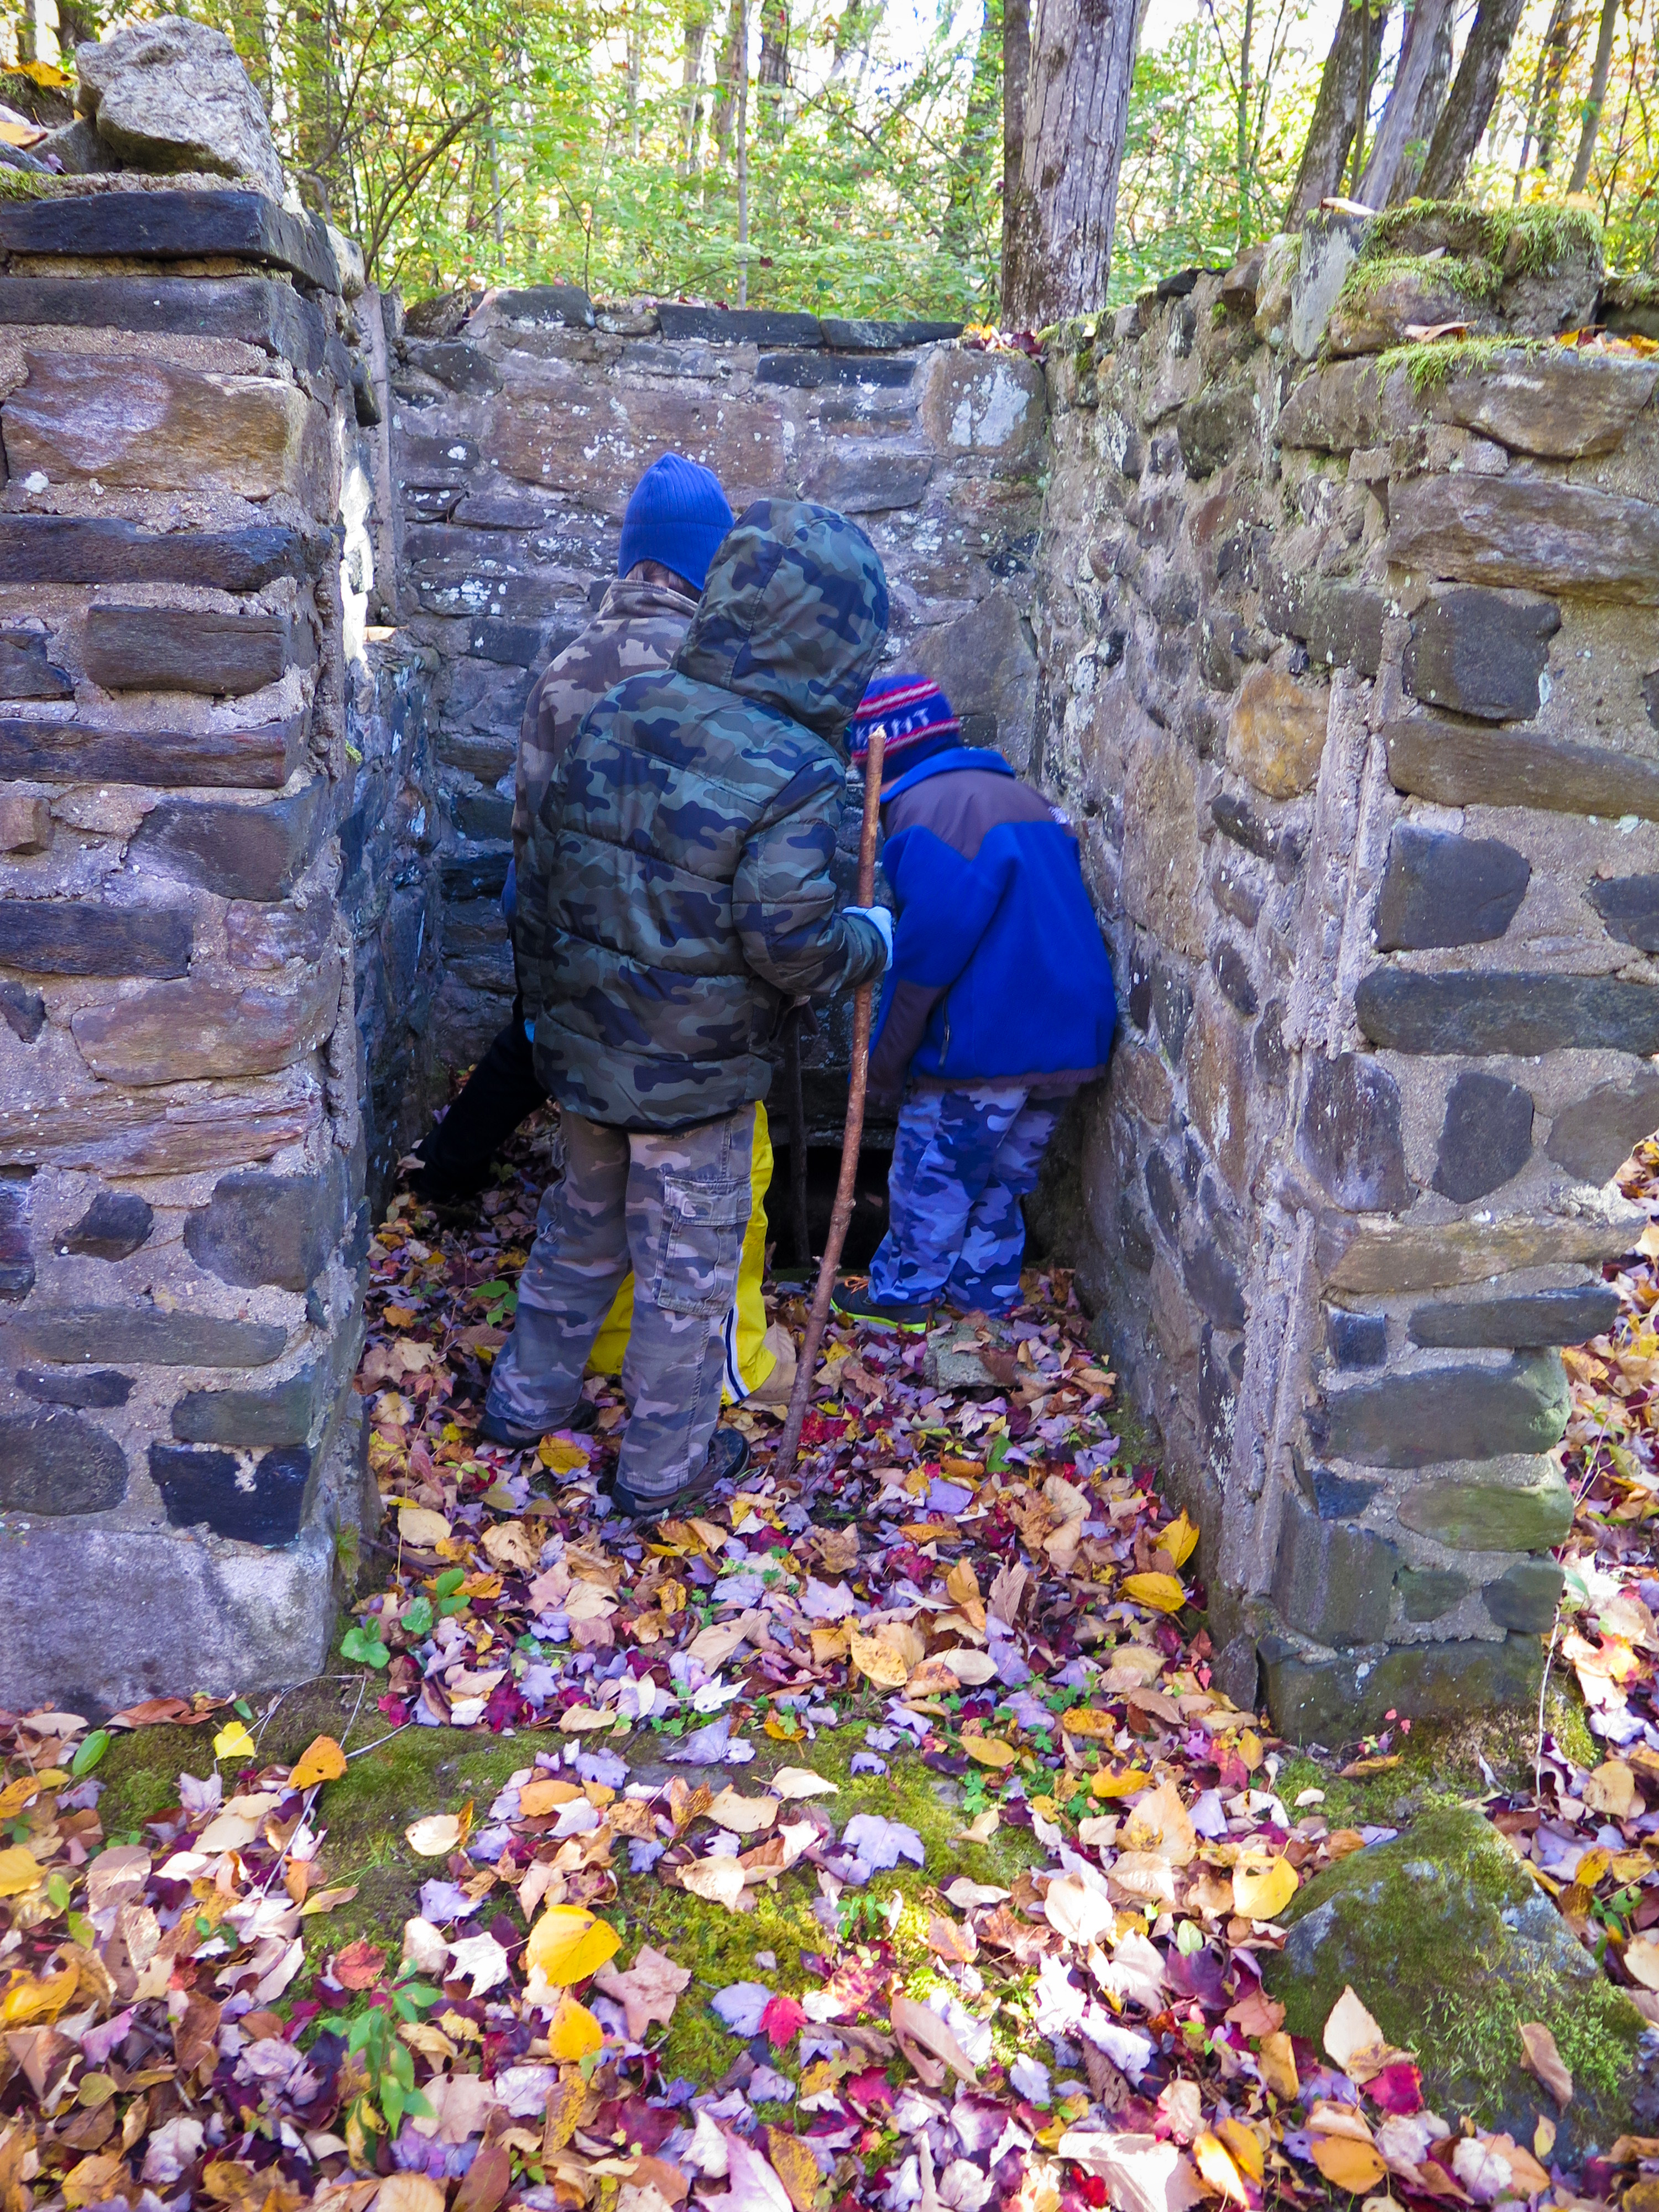 Investigation along the Heritage Trail - Tobin Preserve Oct 2015 MCherniske